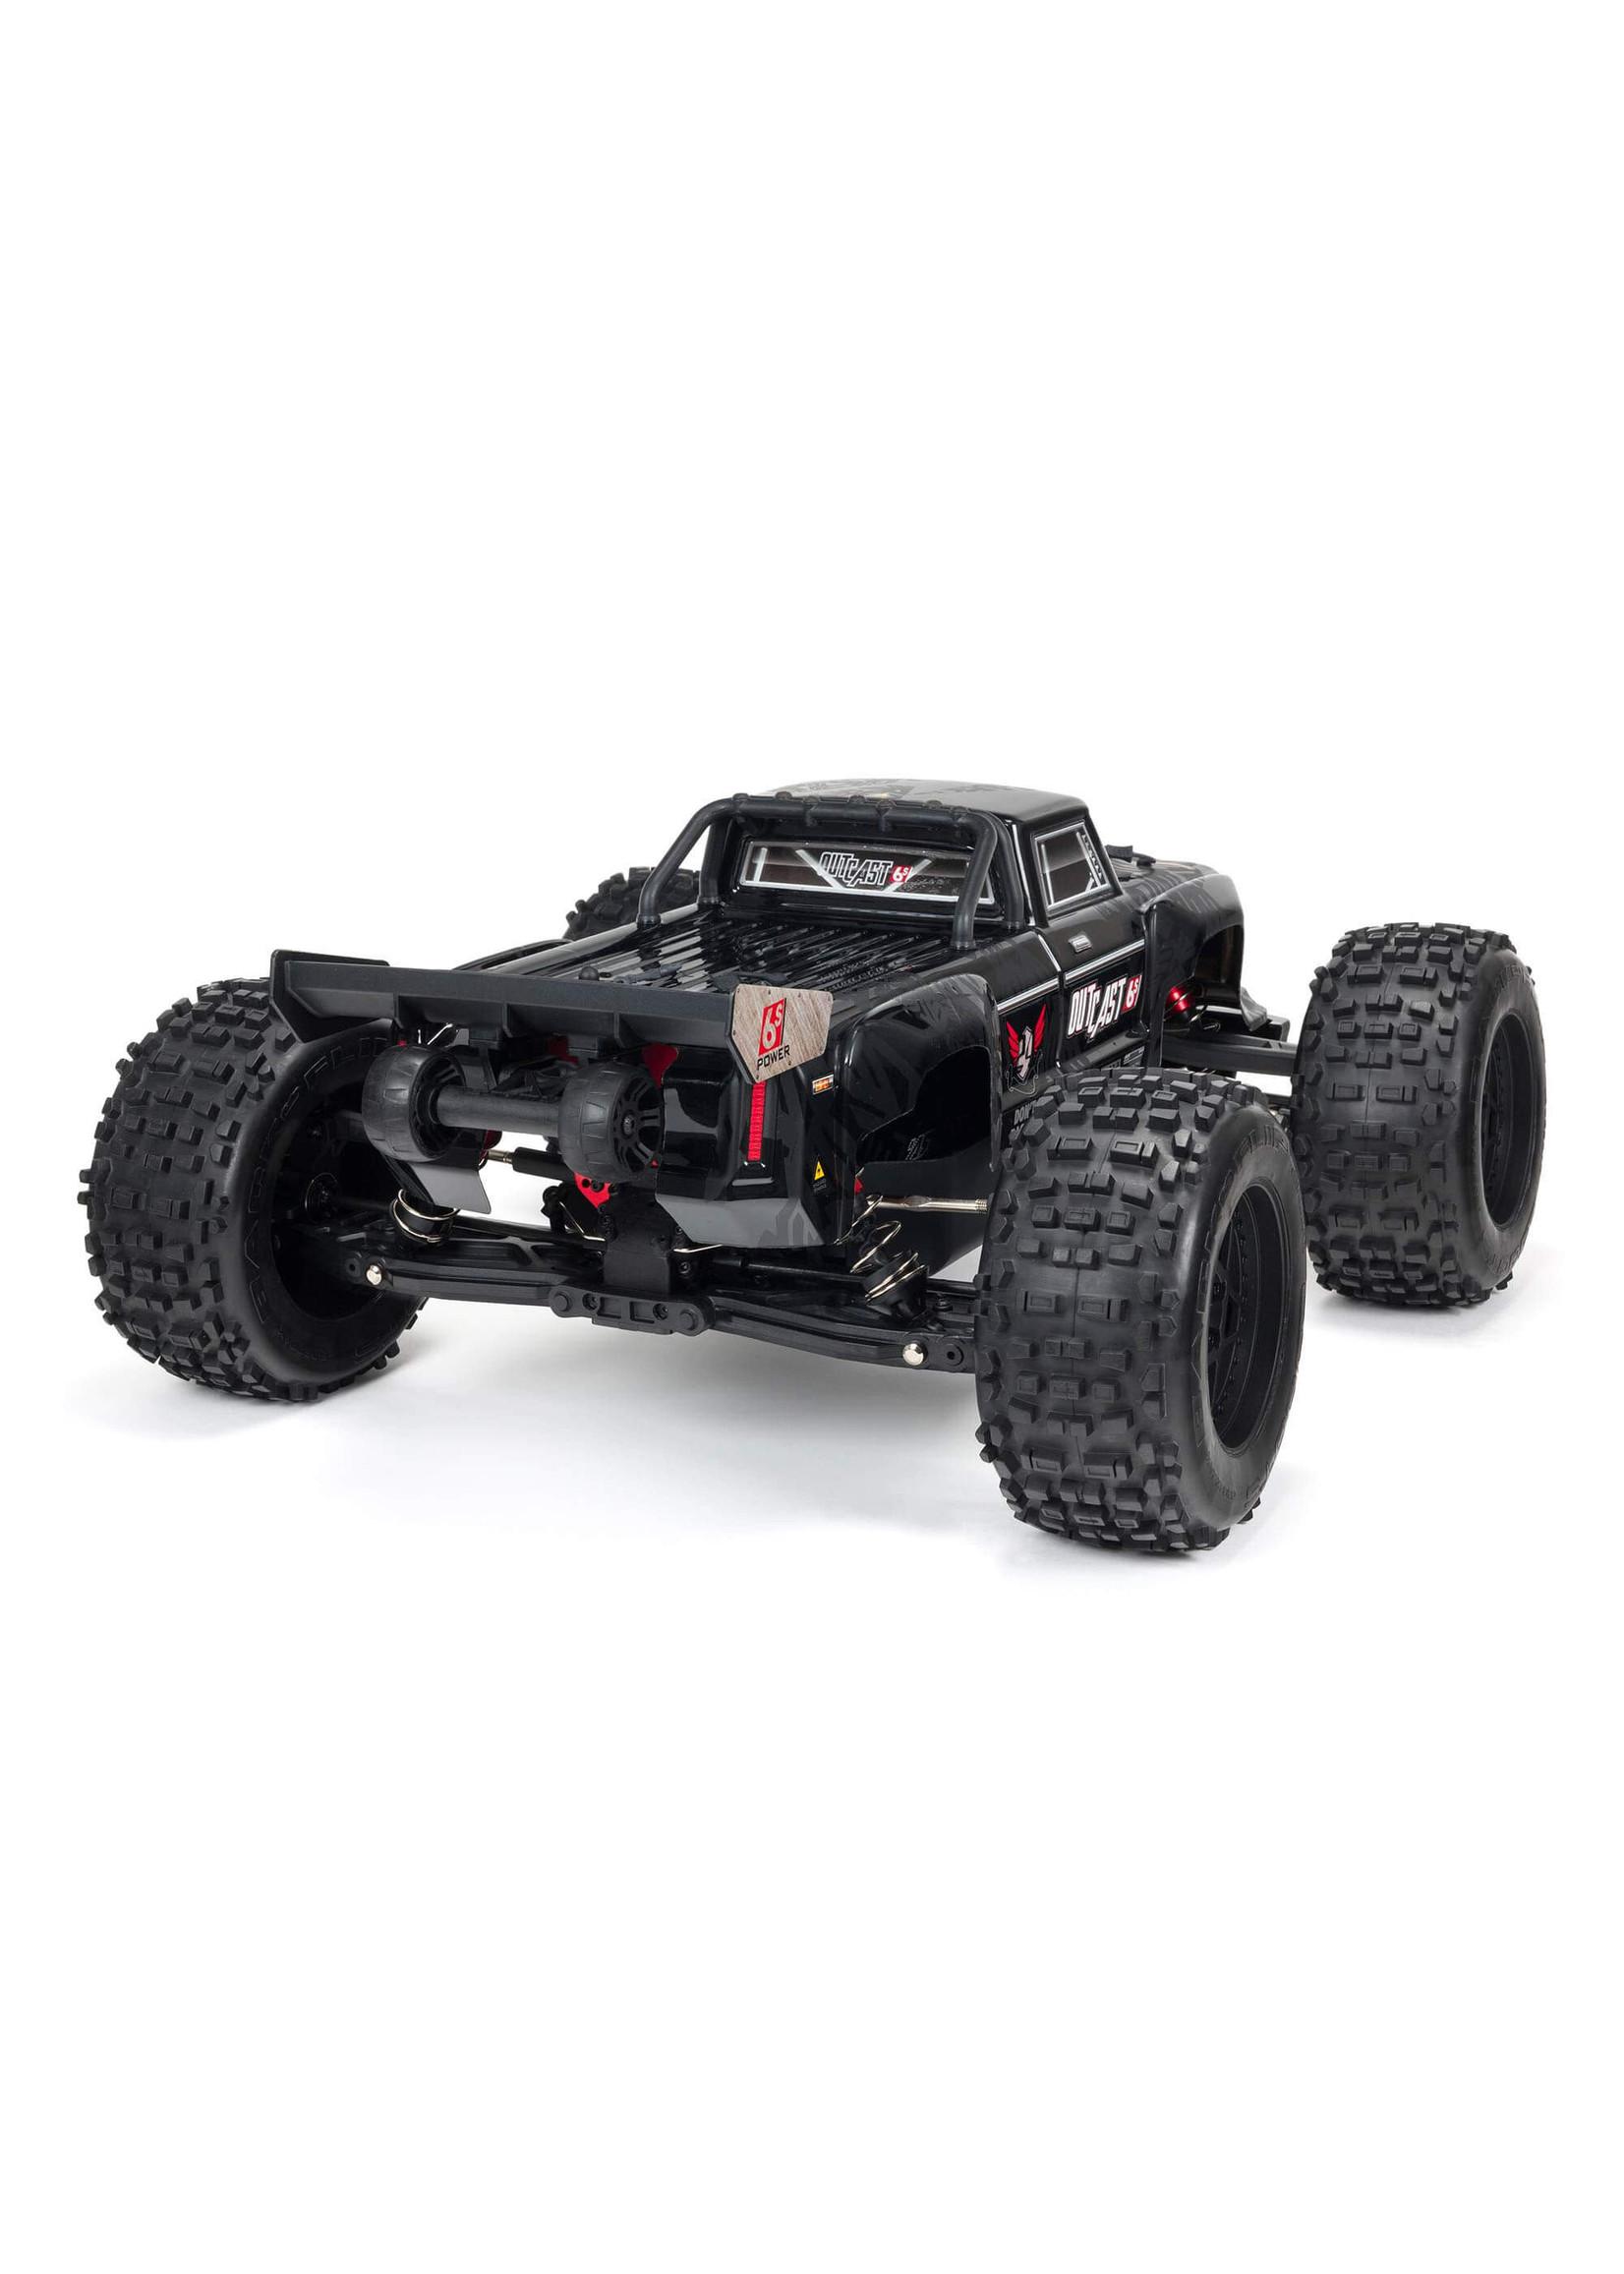 ARRMA ARA8710 ARRMA 1/8 Outcast 6S BLX 4WD EXtreme Bash Stunt Truck RTR, Black